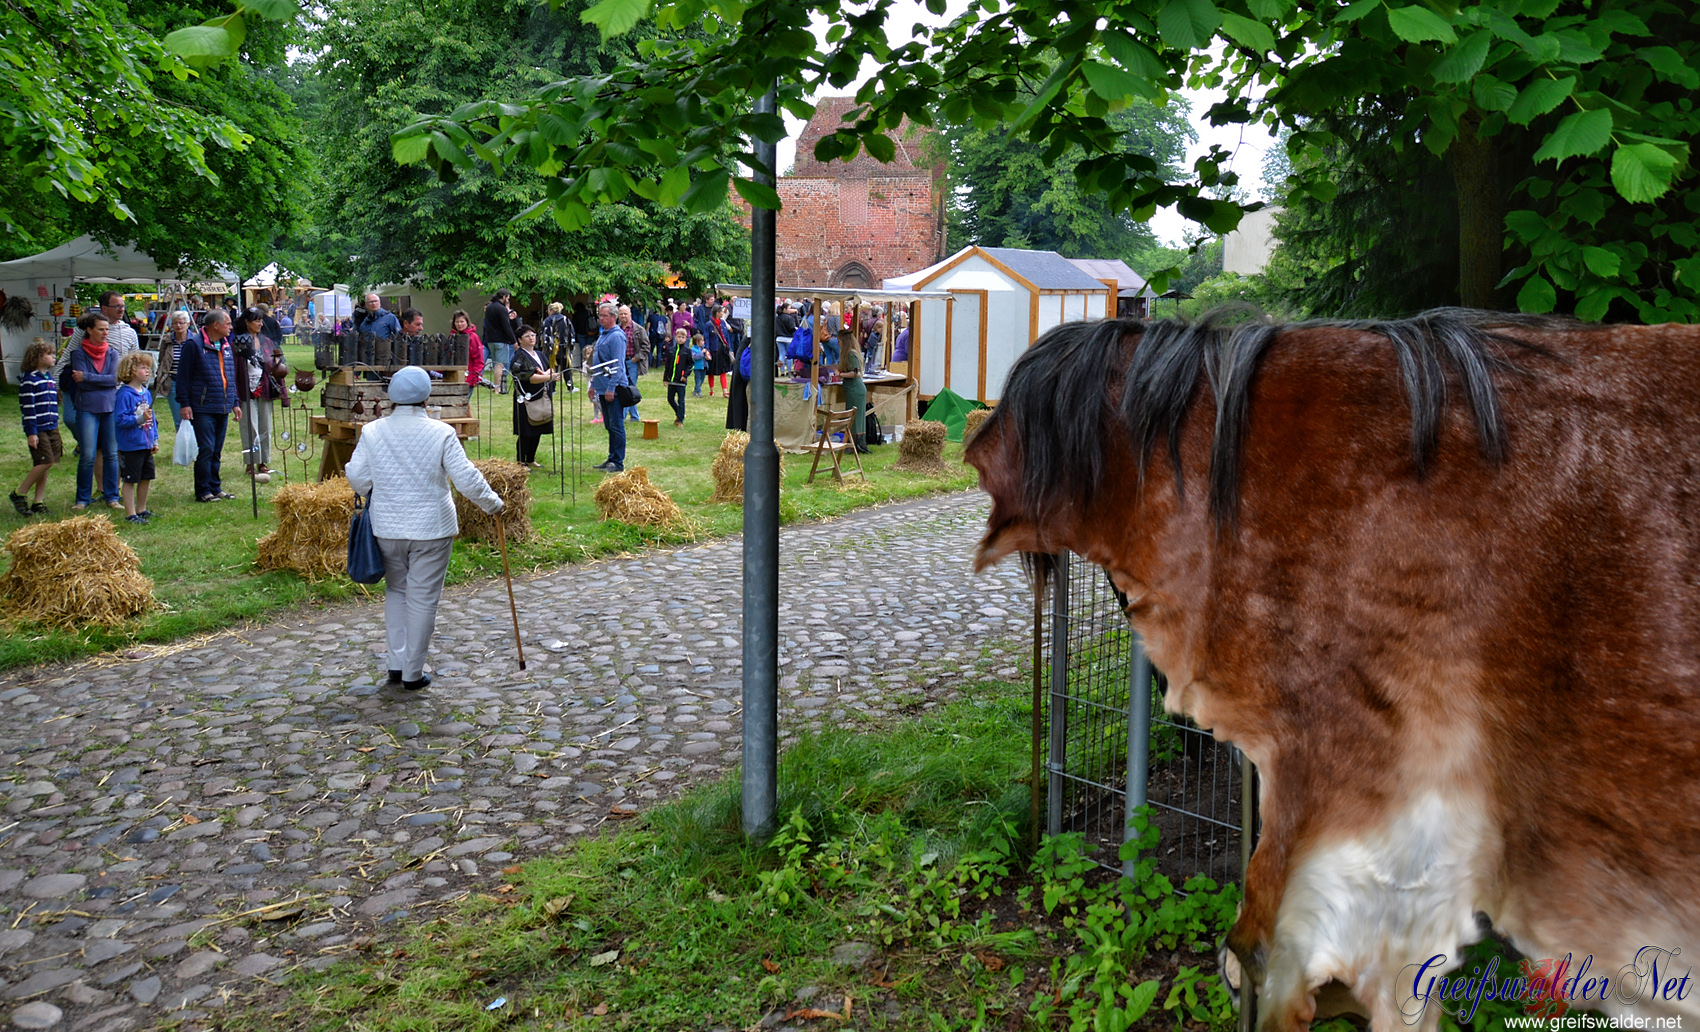 4. Klostermarkt in Greifswald-Eldena